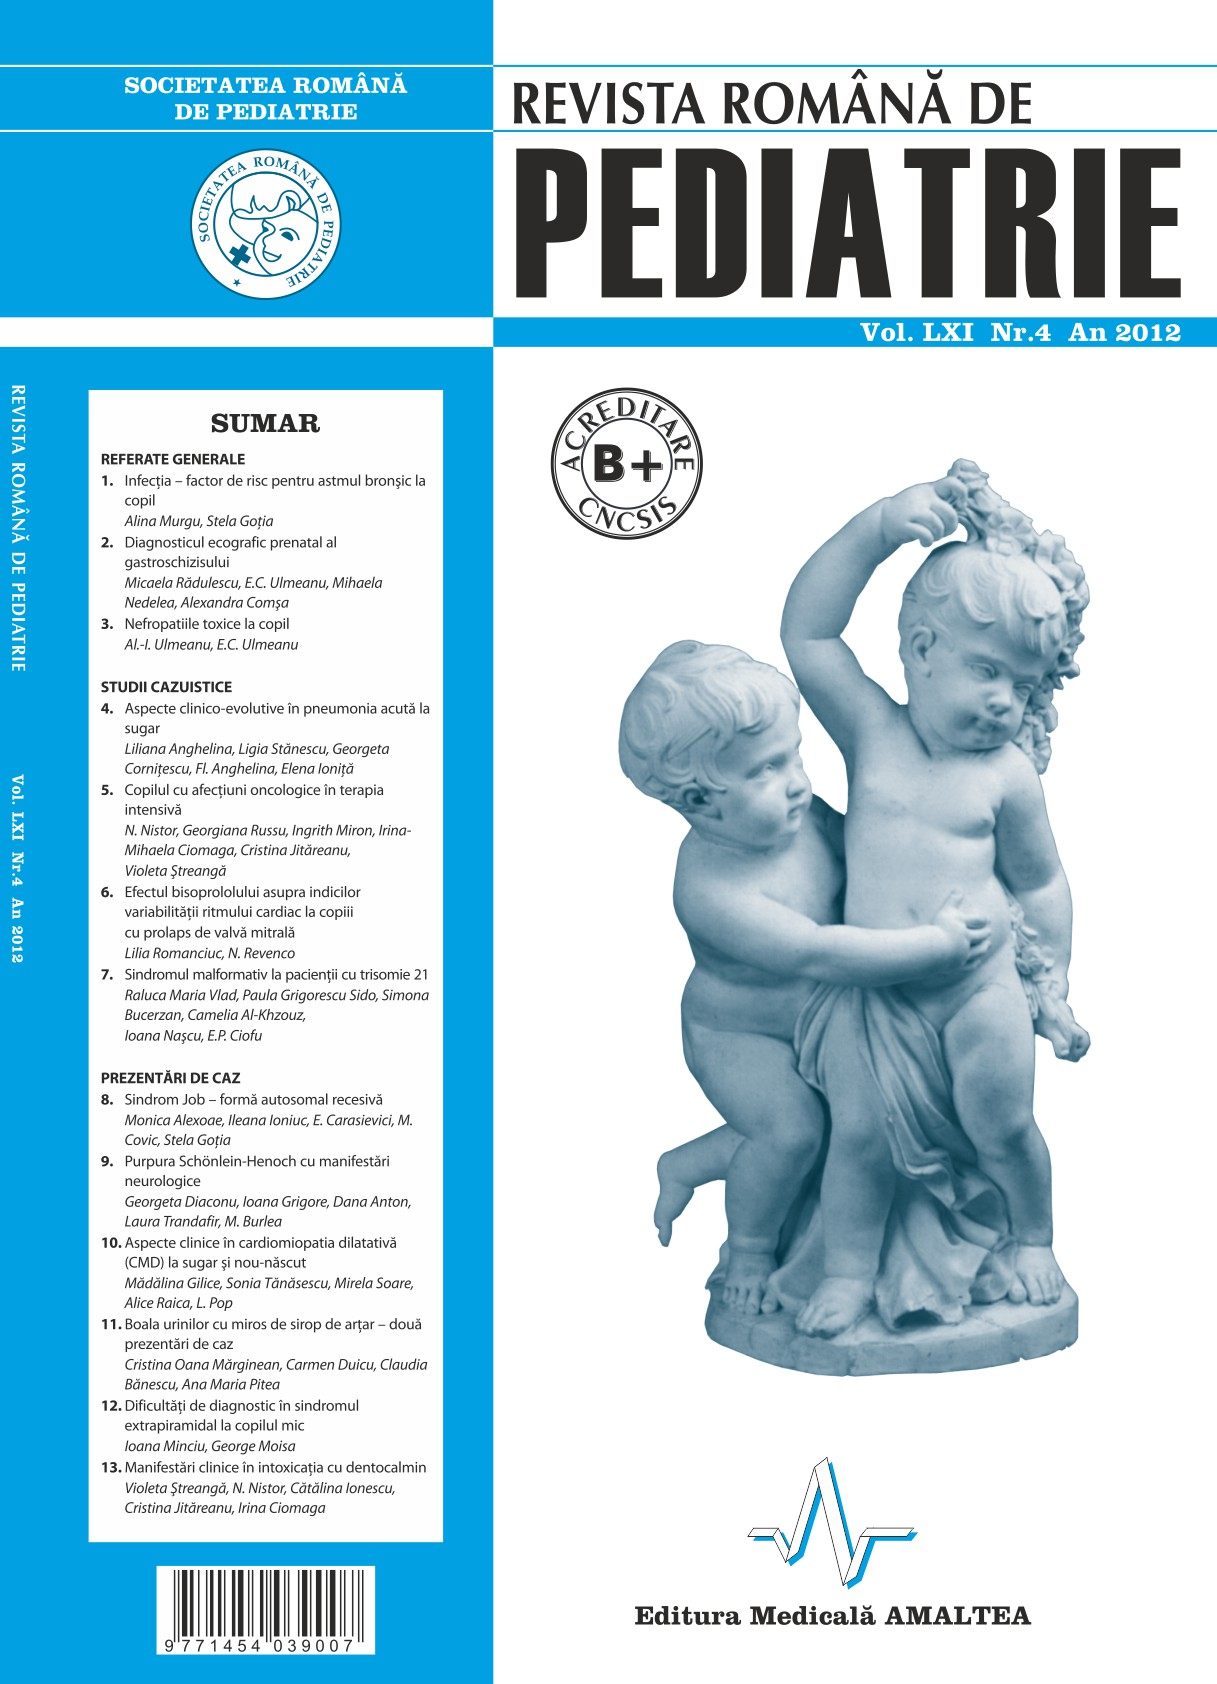 Revista Romana de PEDIATRIE | Volumul LXI, Nr. 4, An 2012